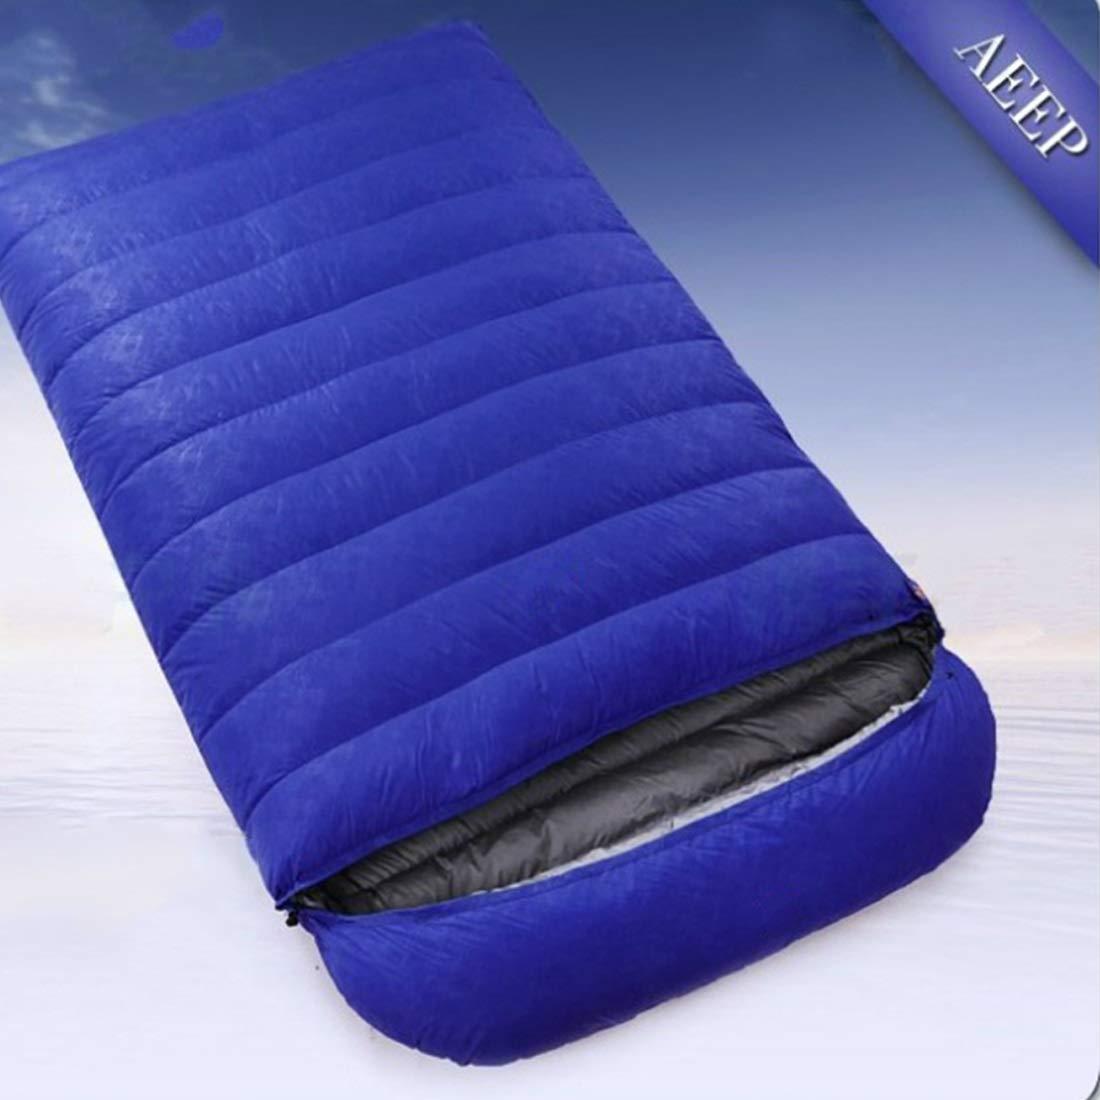 Wanc 旅行用、キャンプ用、ハイキング 遠足 超軽量 寝袋 B07KQRLG44 ブルー 1000g 1000g|ブルー